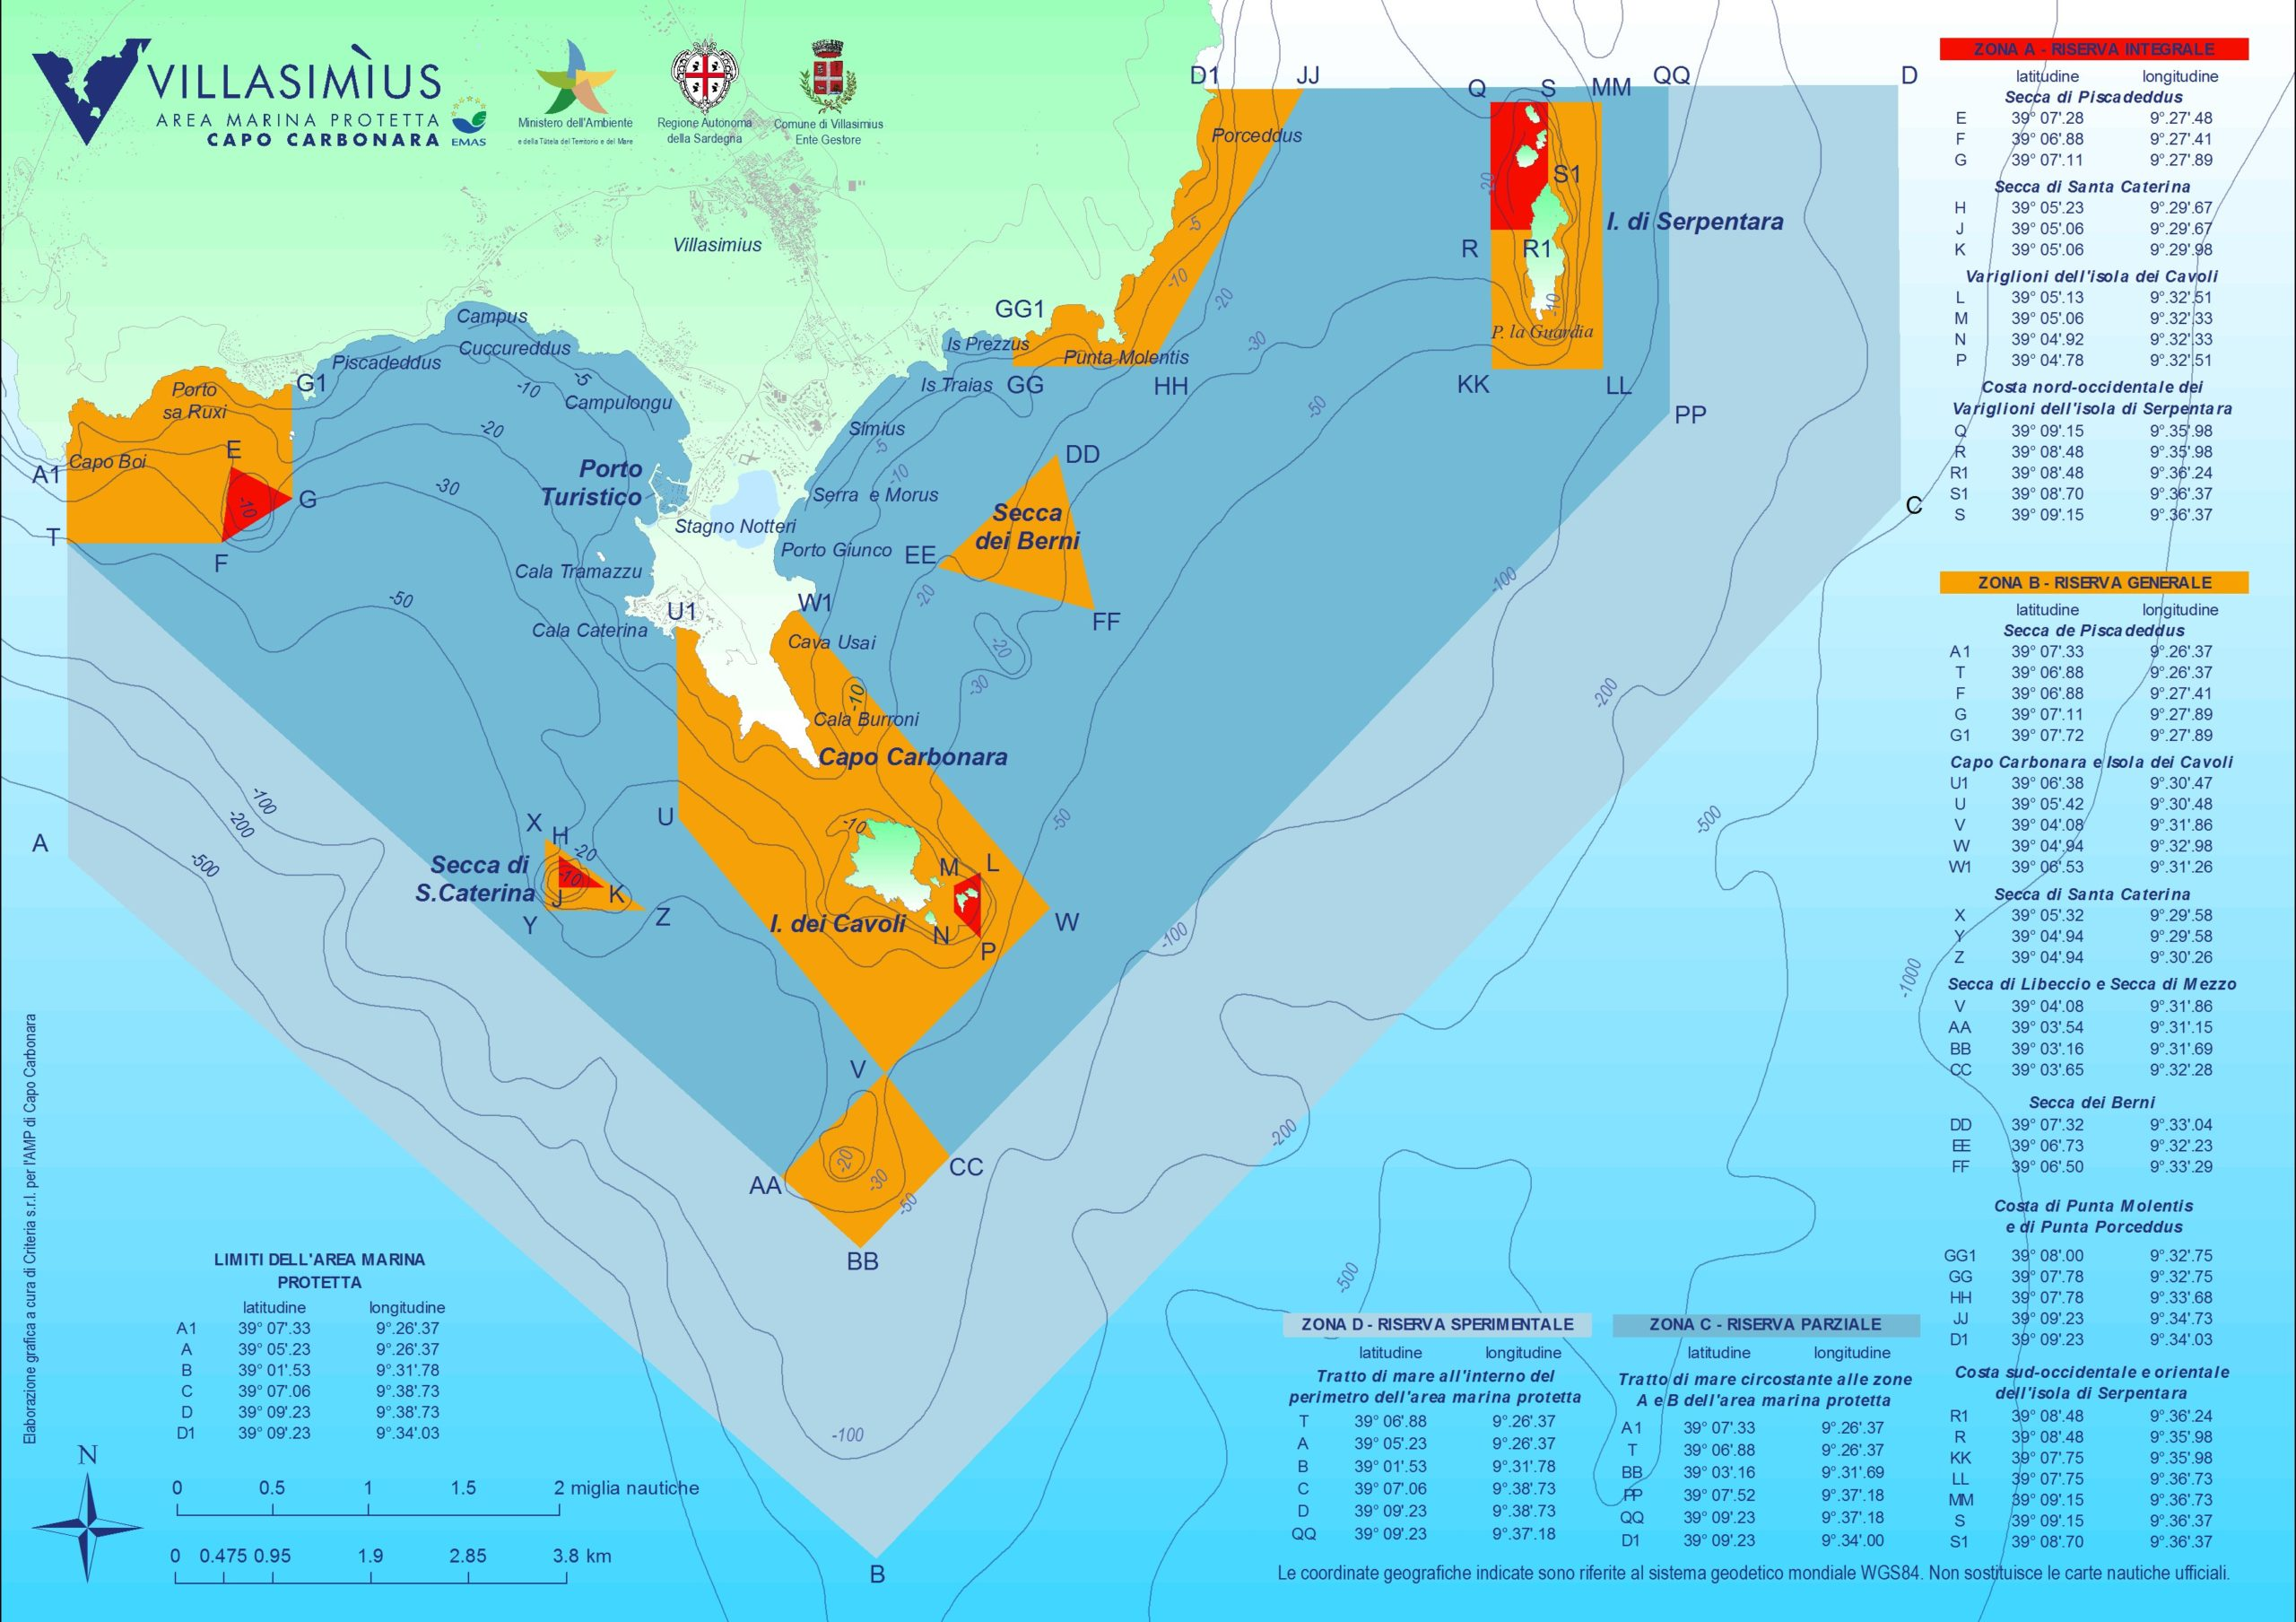 Area Marina Protetta Villasimius Zone a b c d